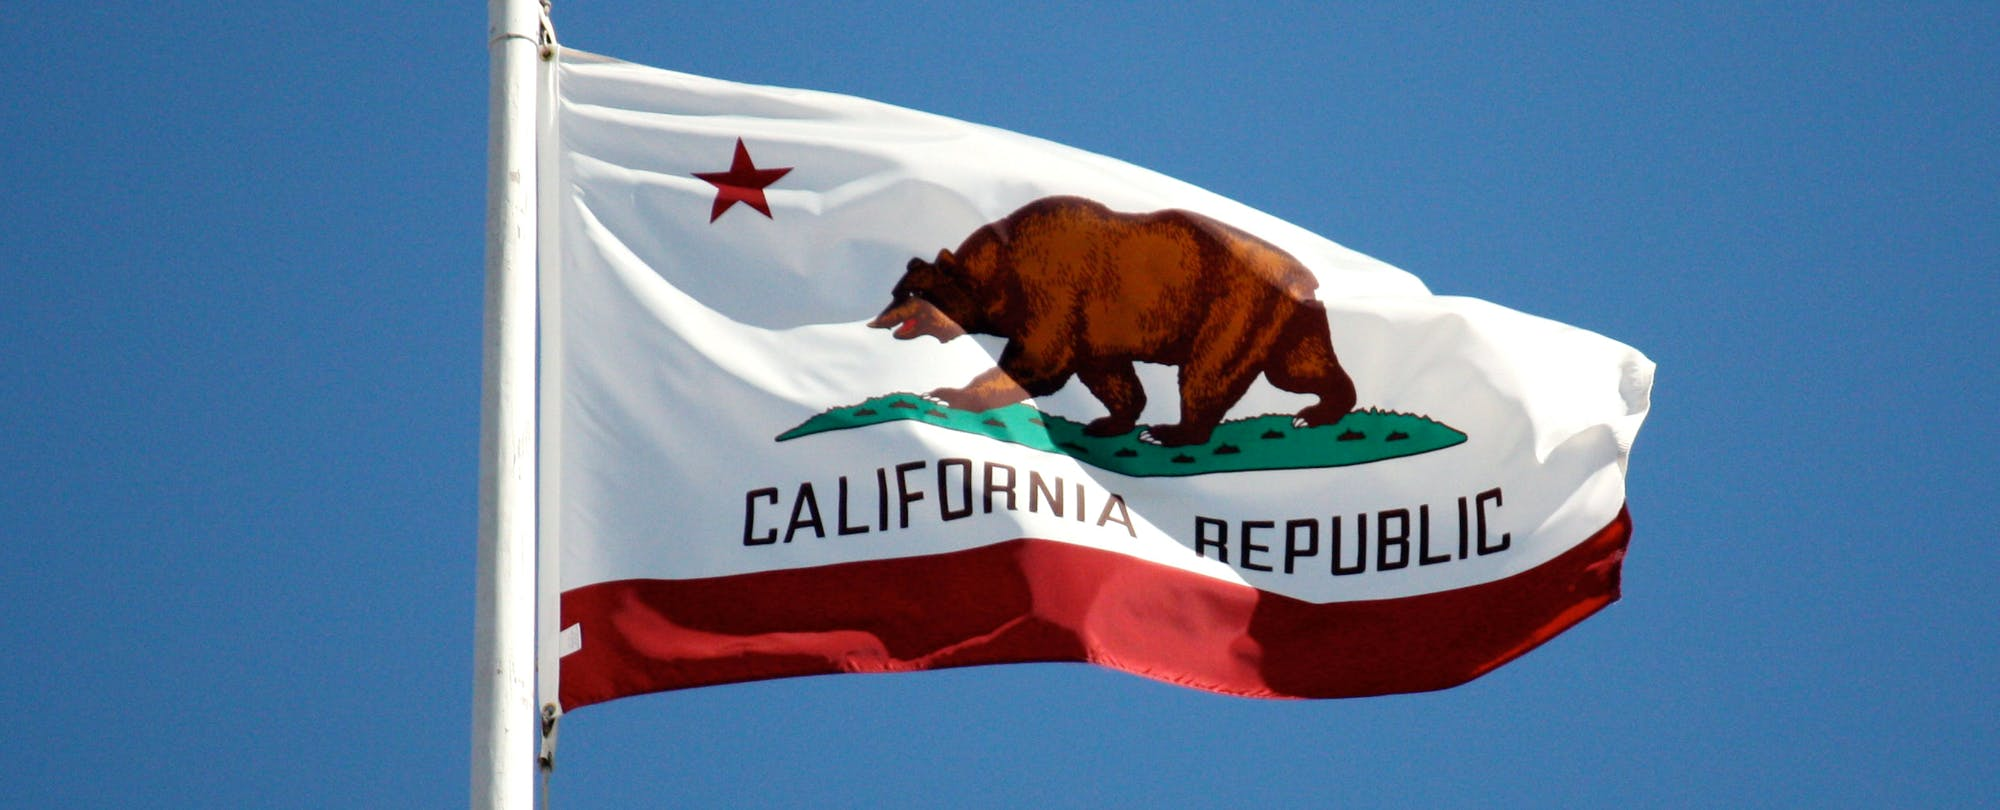 EdSurge's California Summit: A Meeting of Great Minds